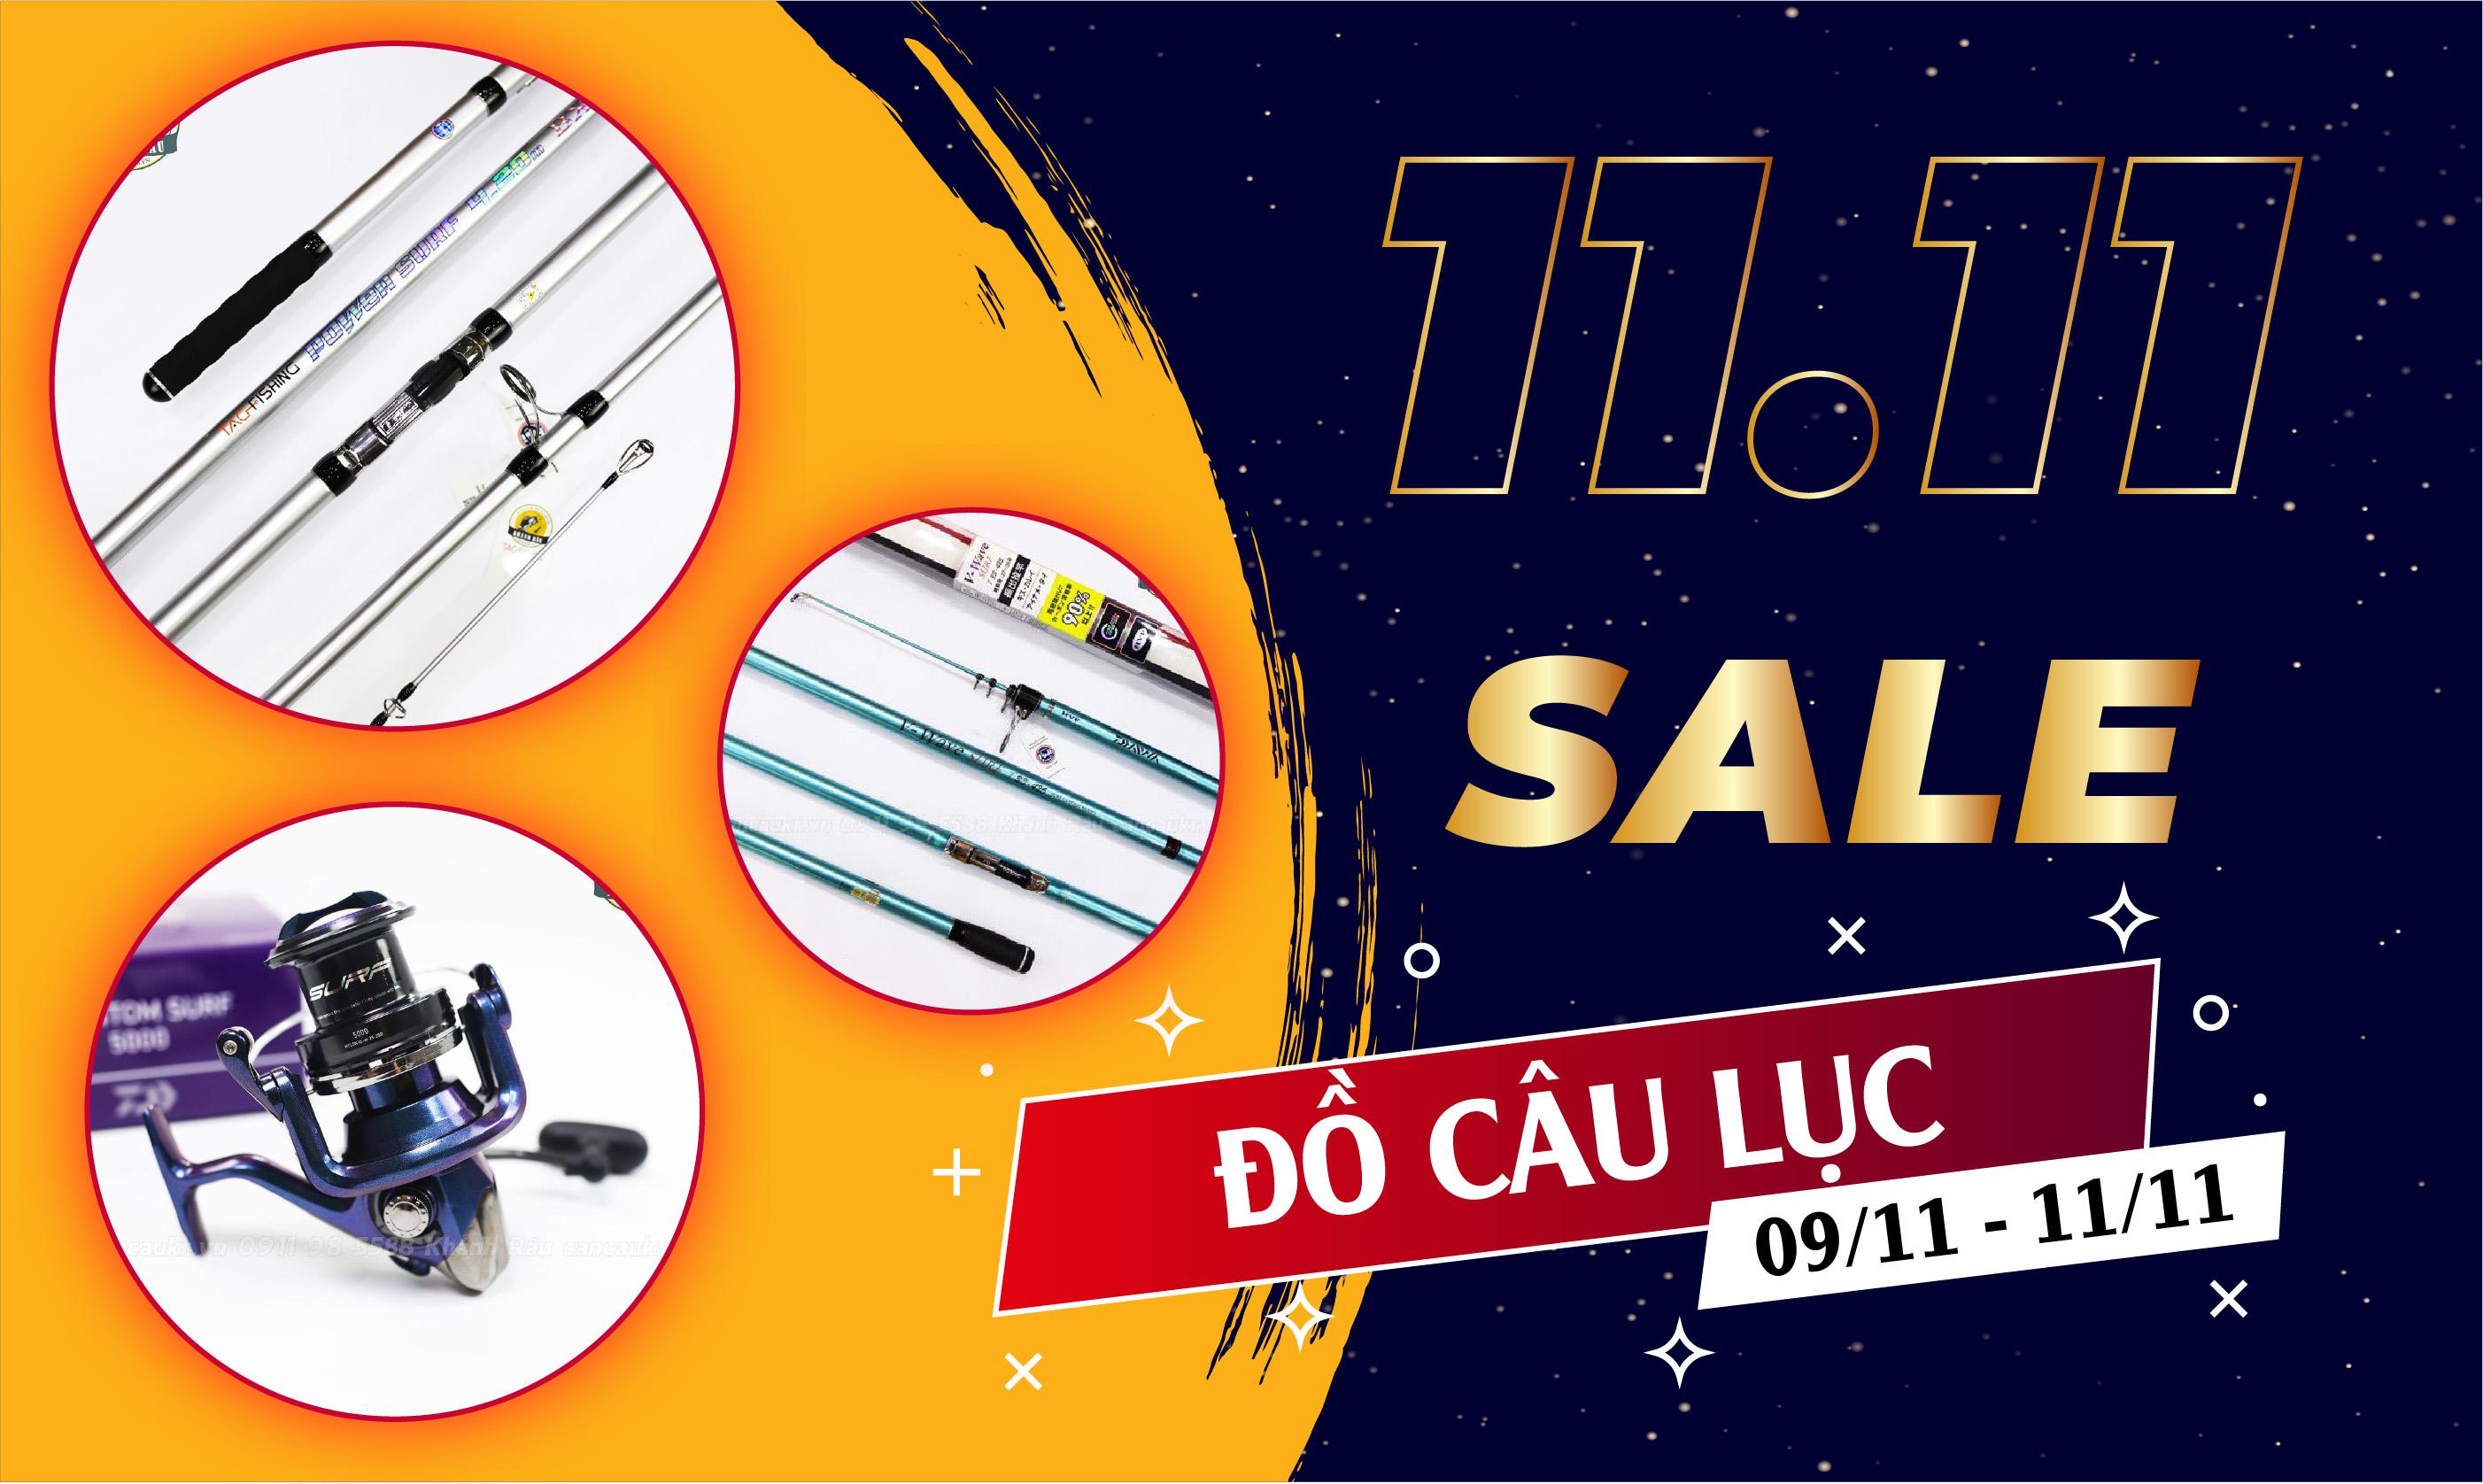 Sale 11-11 Lục